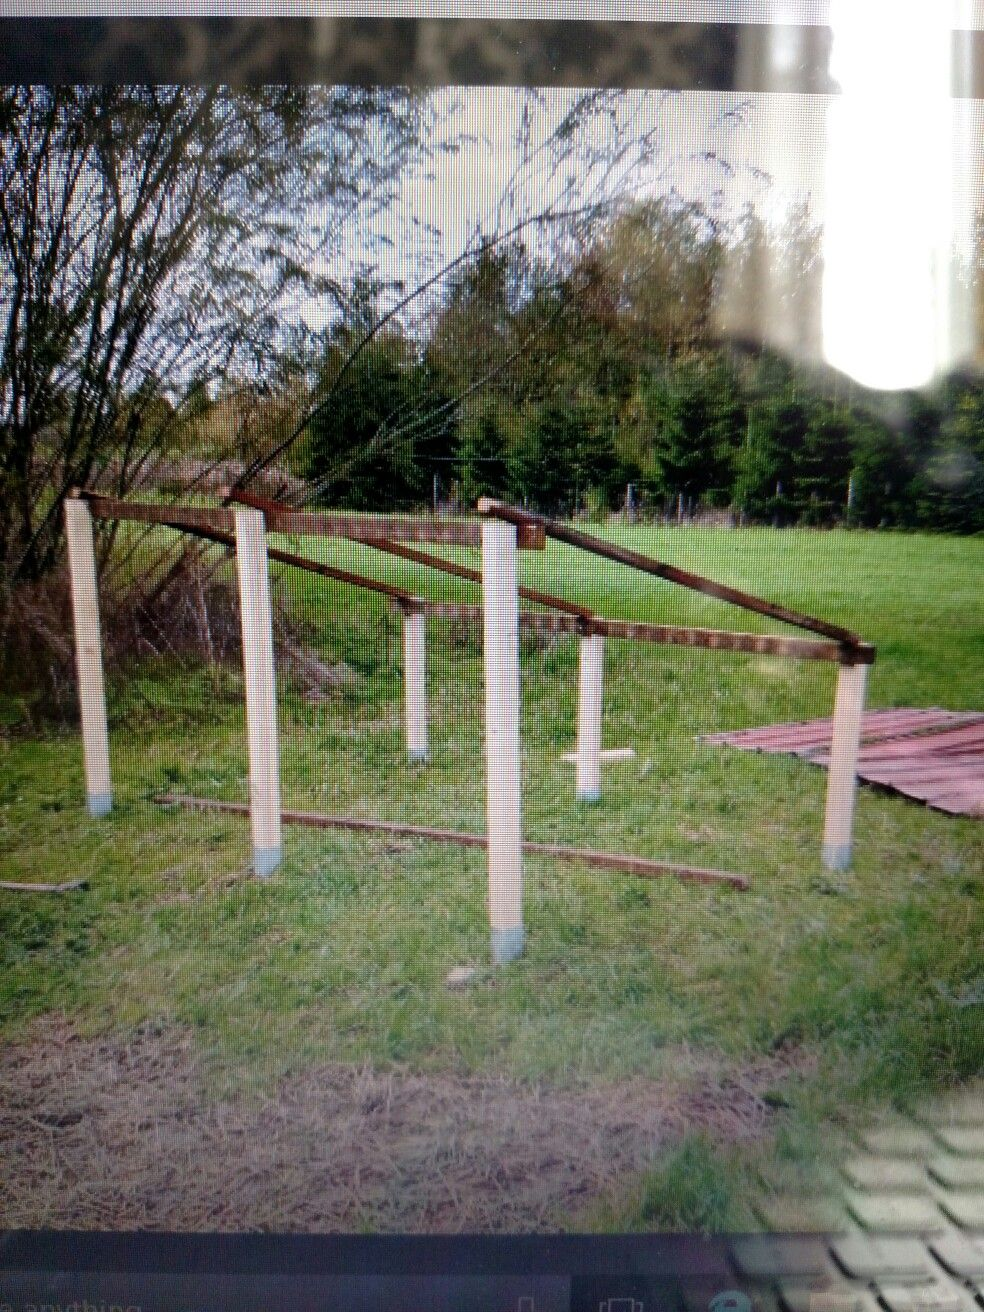 Pin by kelly schultz on farm garden arch outdoor